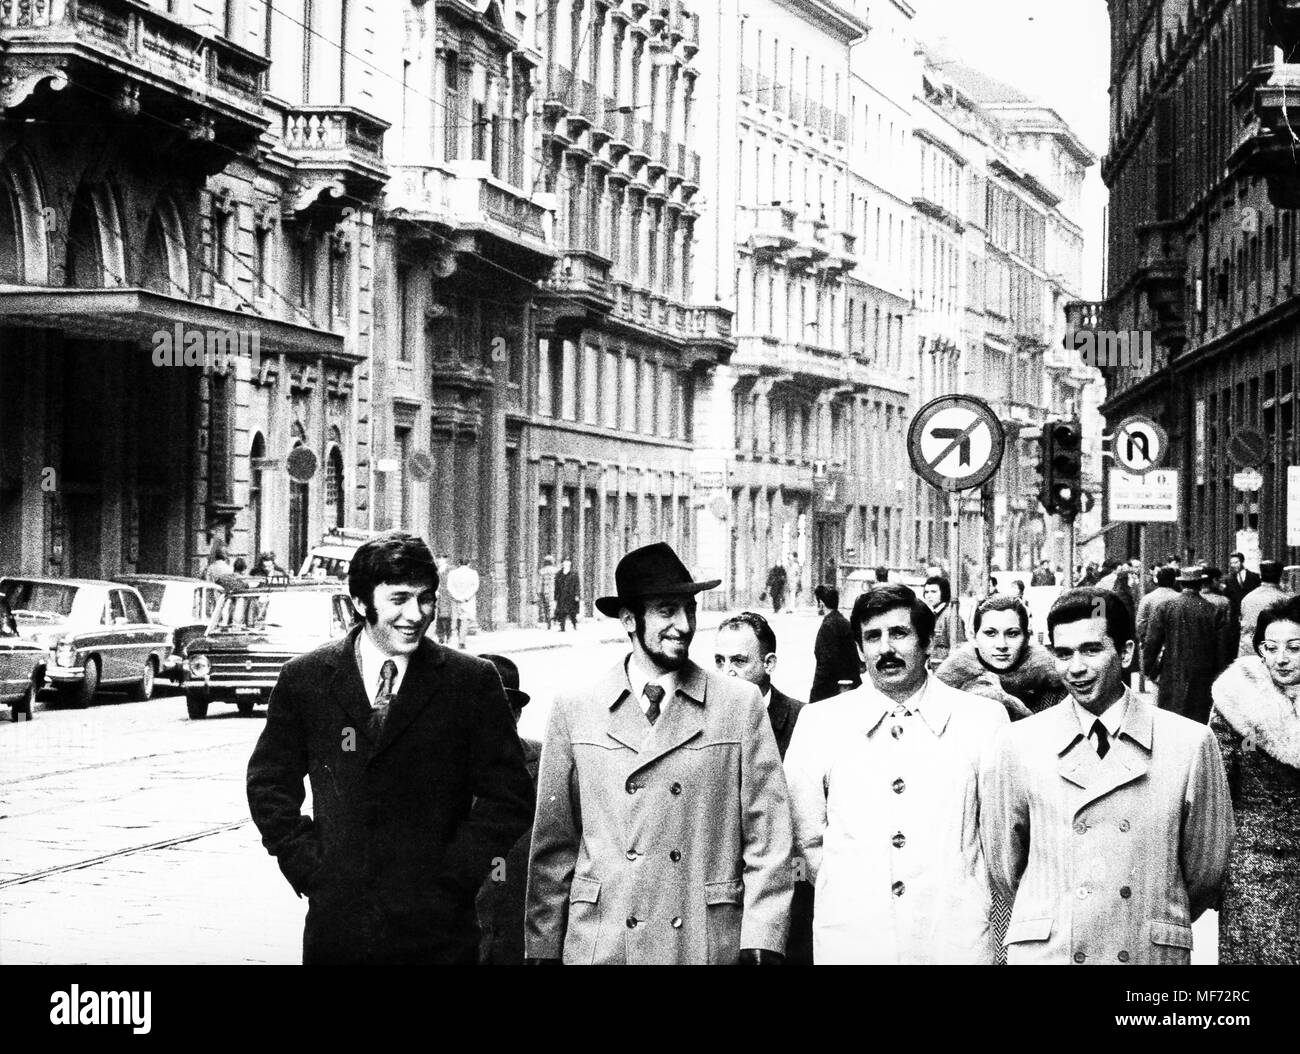 milan, italy, 70s - Stock Image